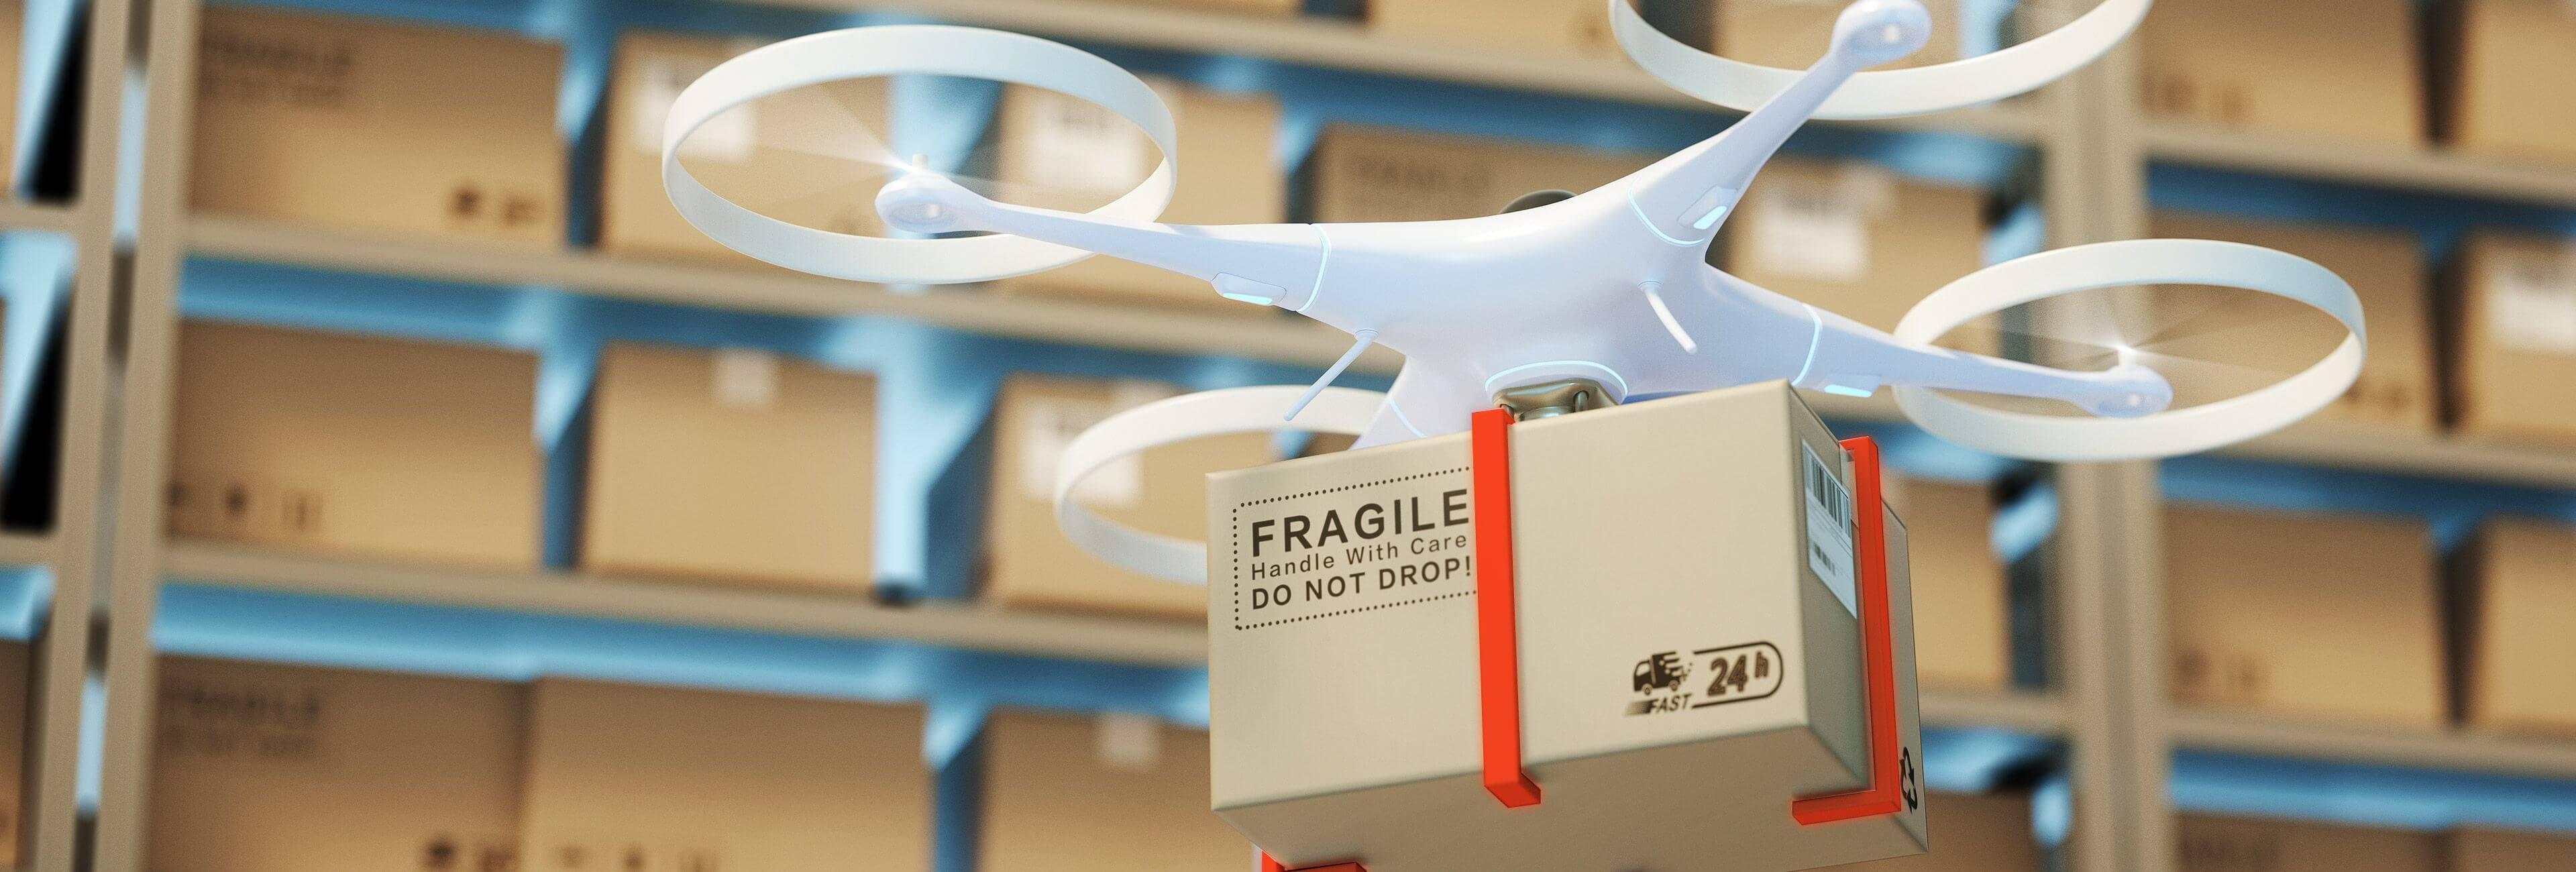 logistics automation